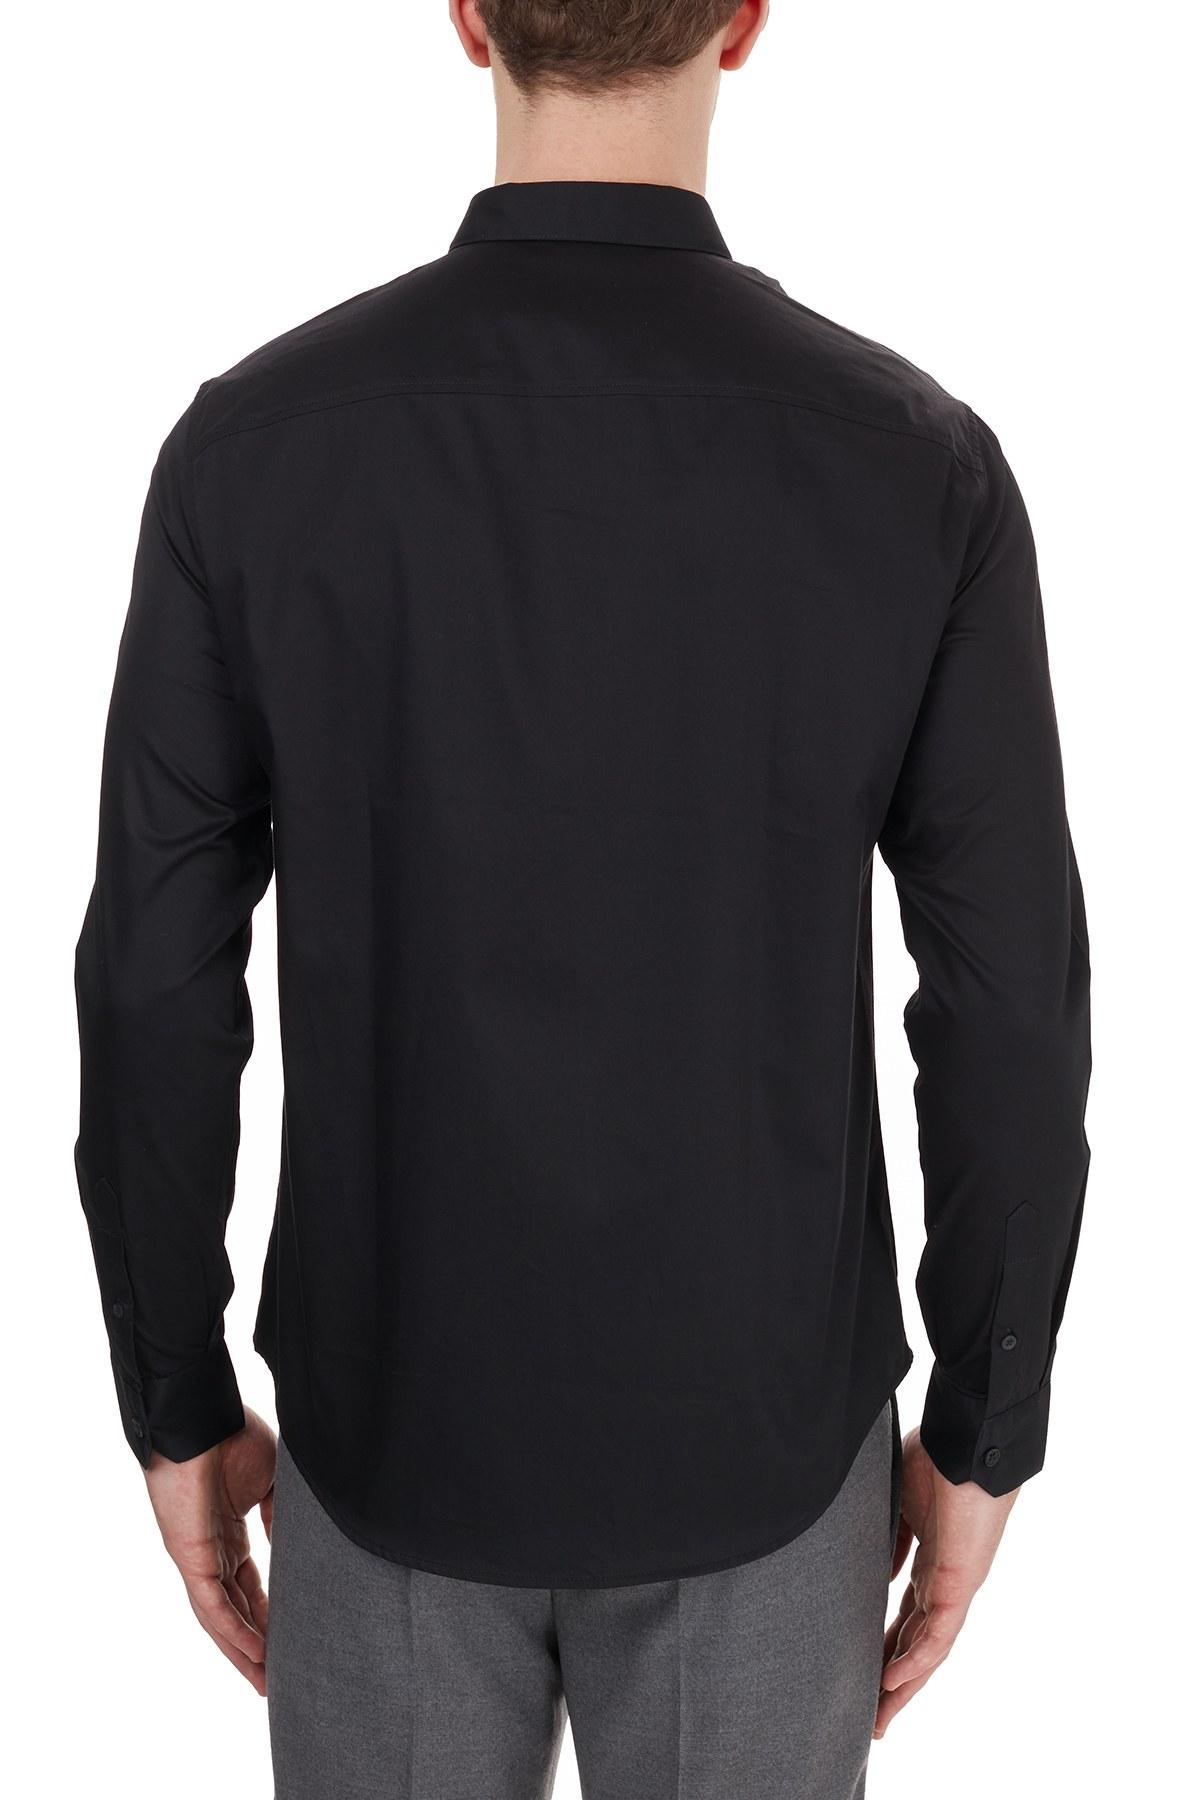 Armani Exchange % 100 Pamuklu Uzun Kollu Erkek Gömlek 6HZC43 ZNAUZ 1200 SİYAH